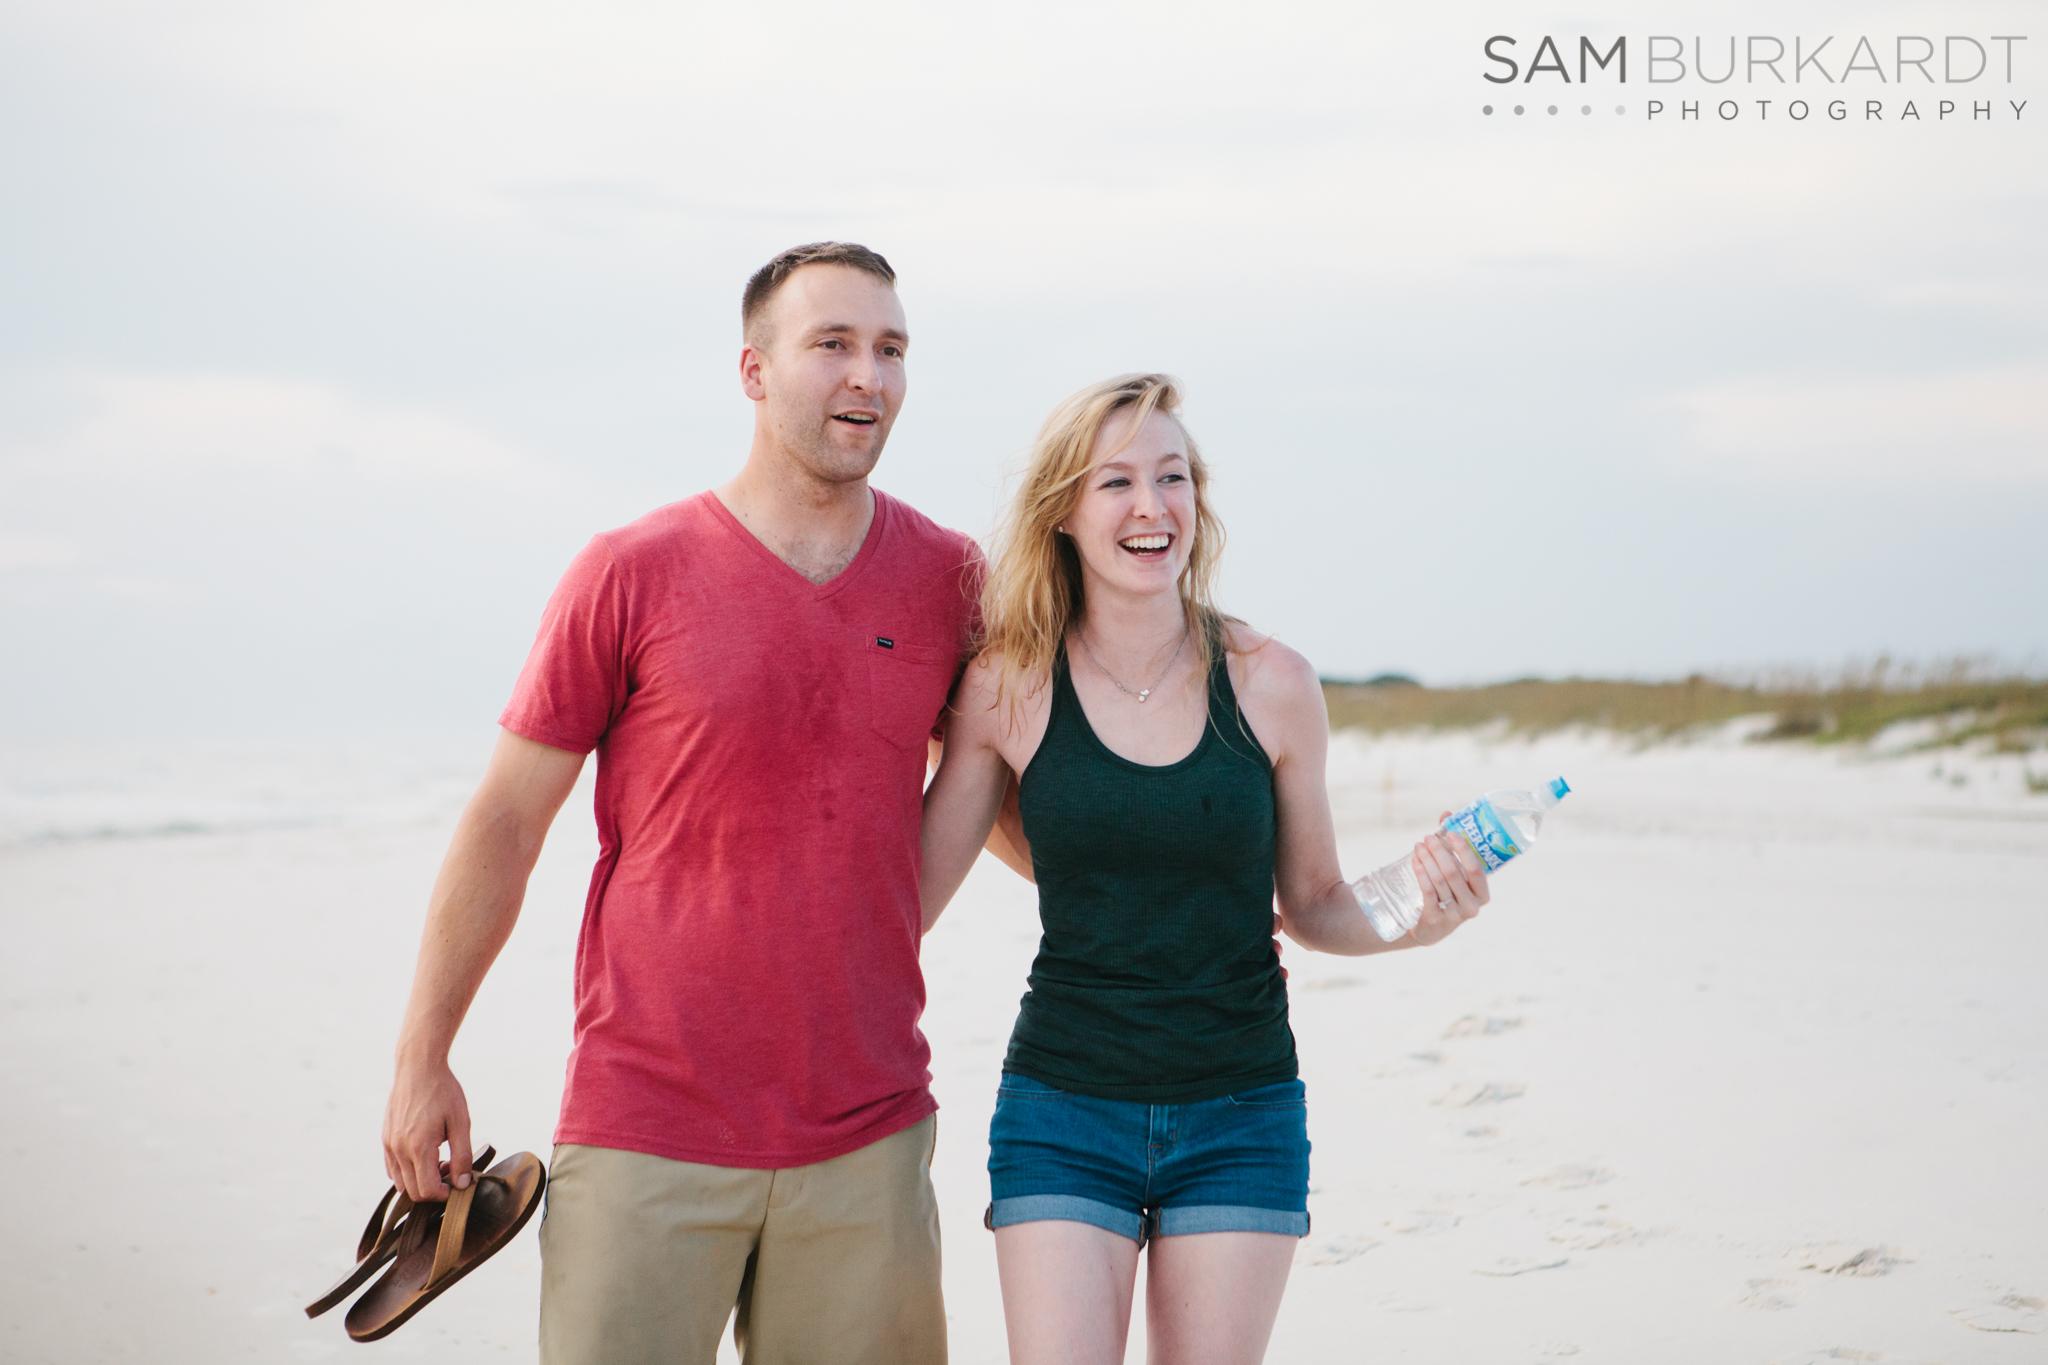 samburkardt_engagement_vacation_beach_cape_san_blas_florida_camping_gopro_0010.jpg